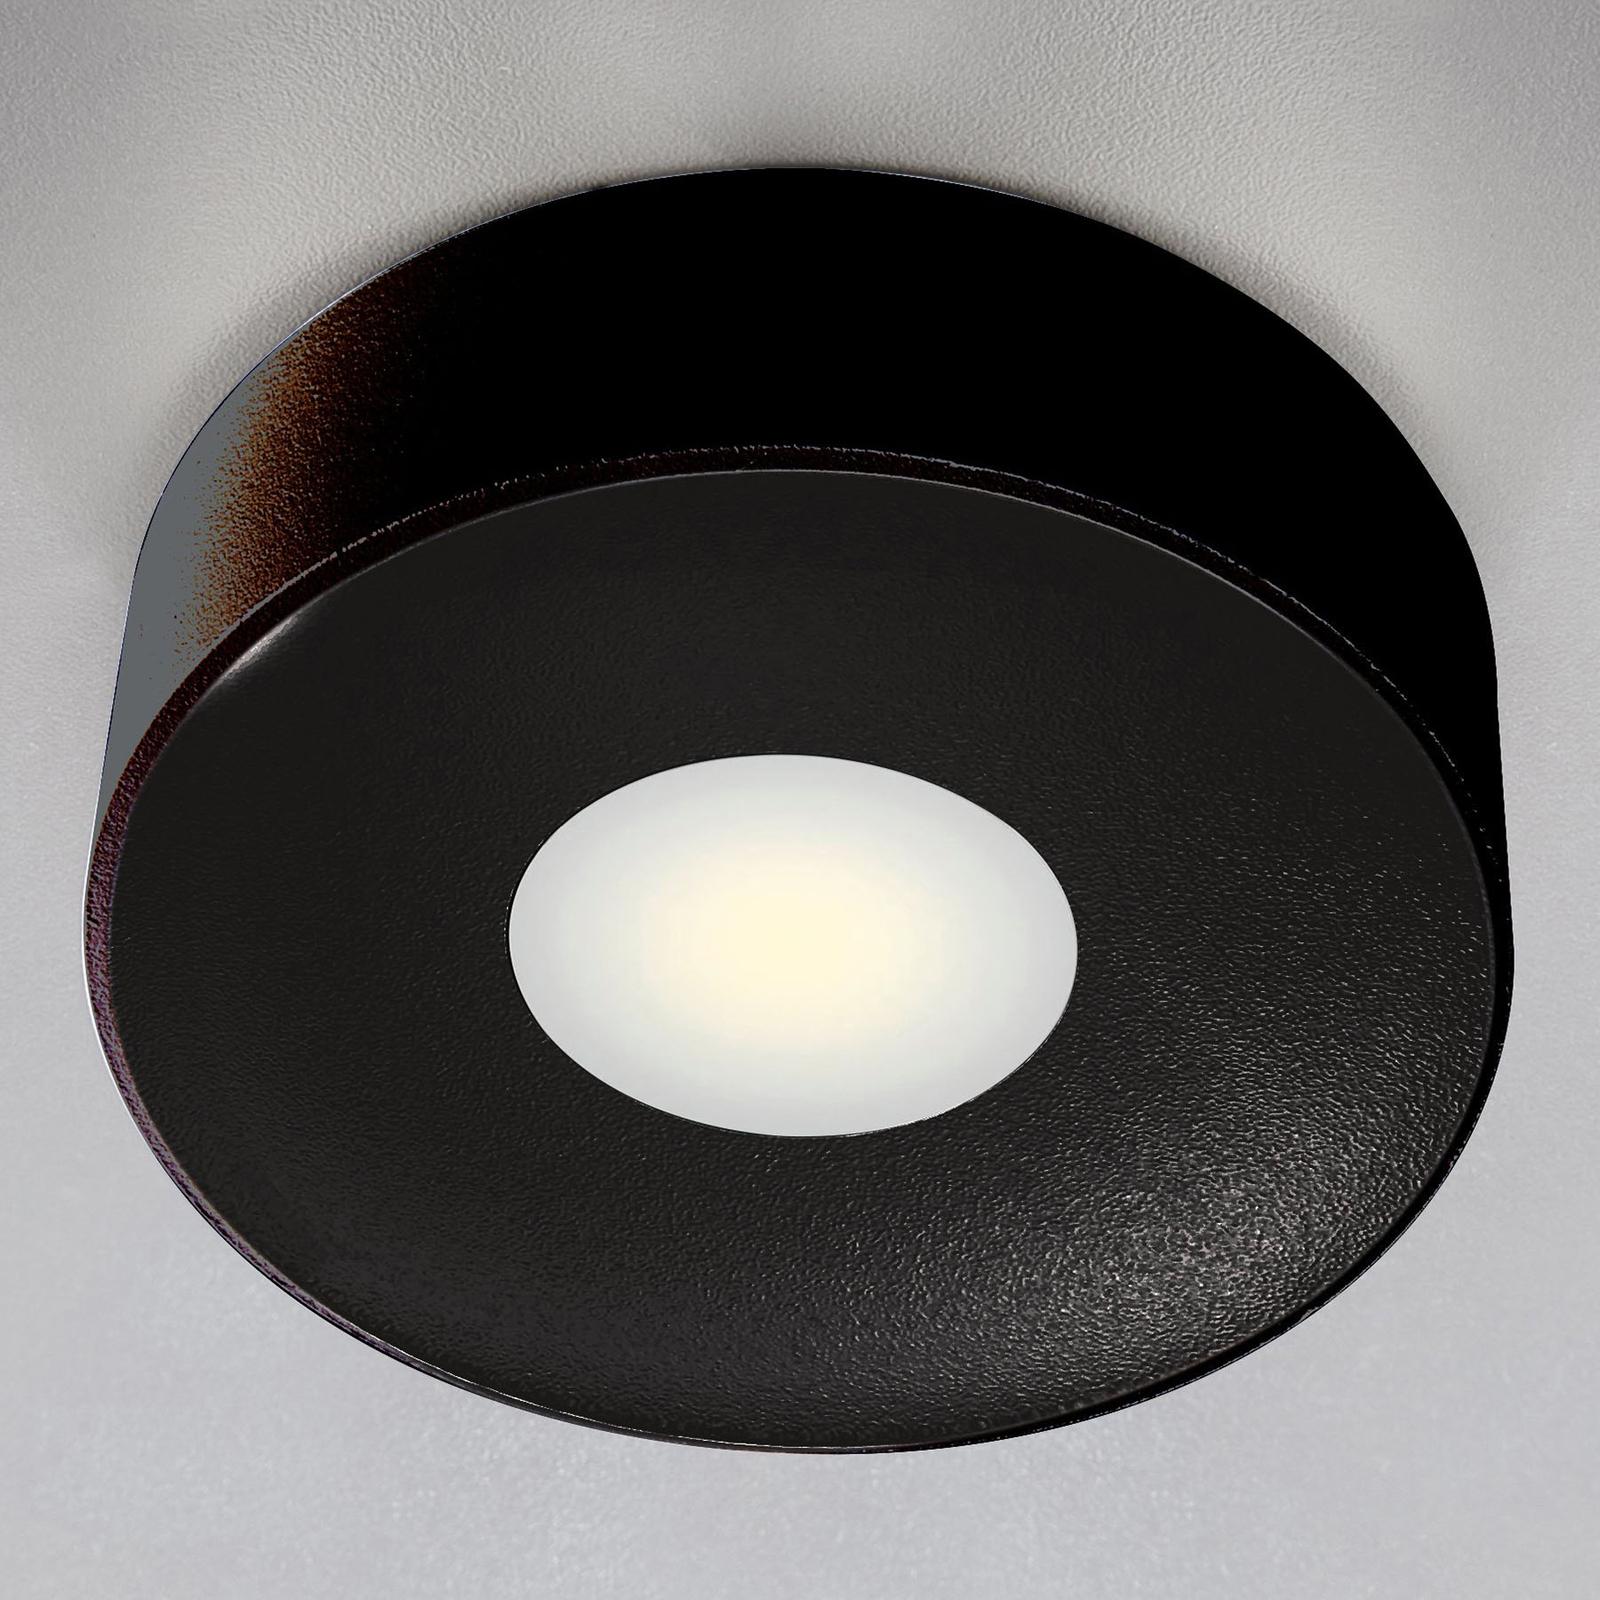 Lampa sufitowa zewnętrzna LED Girona, antracytowa